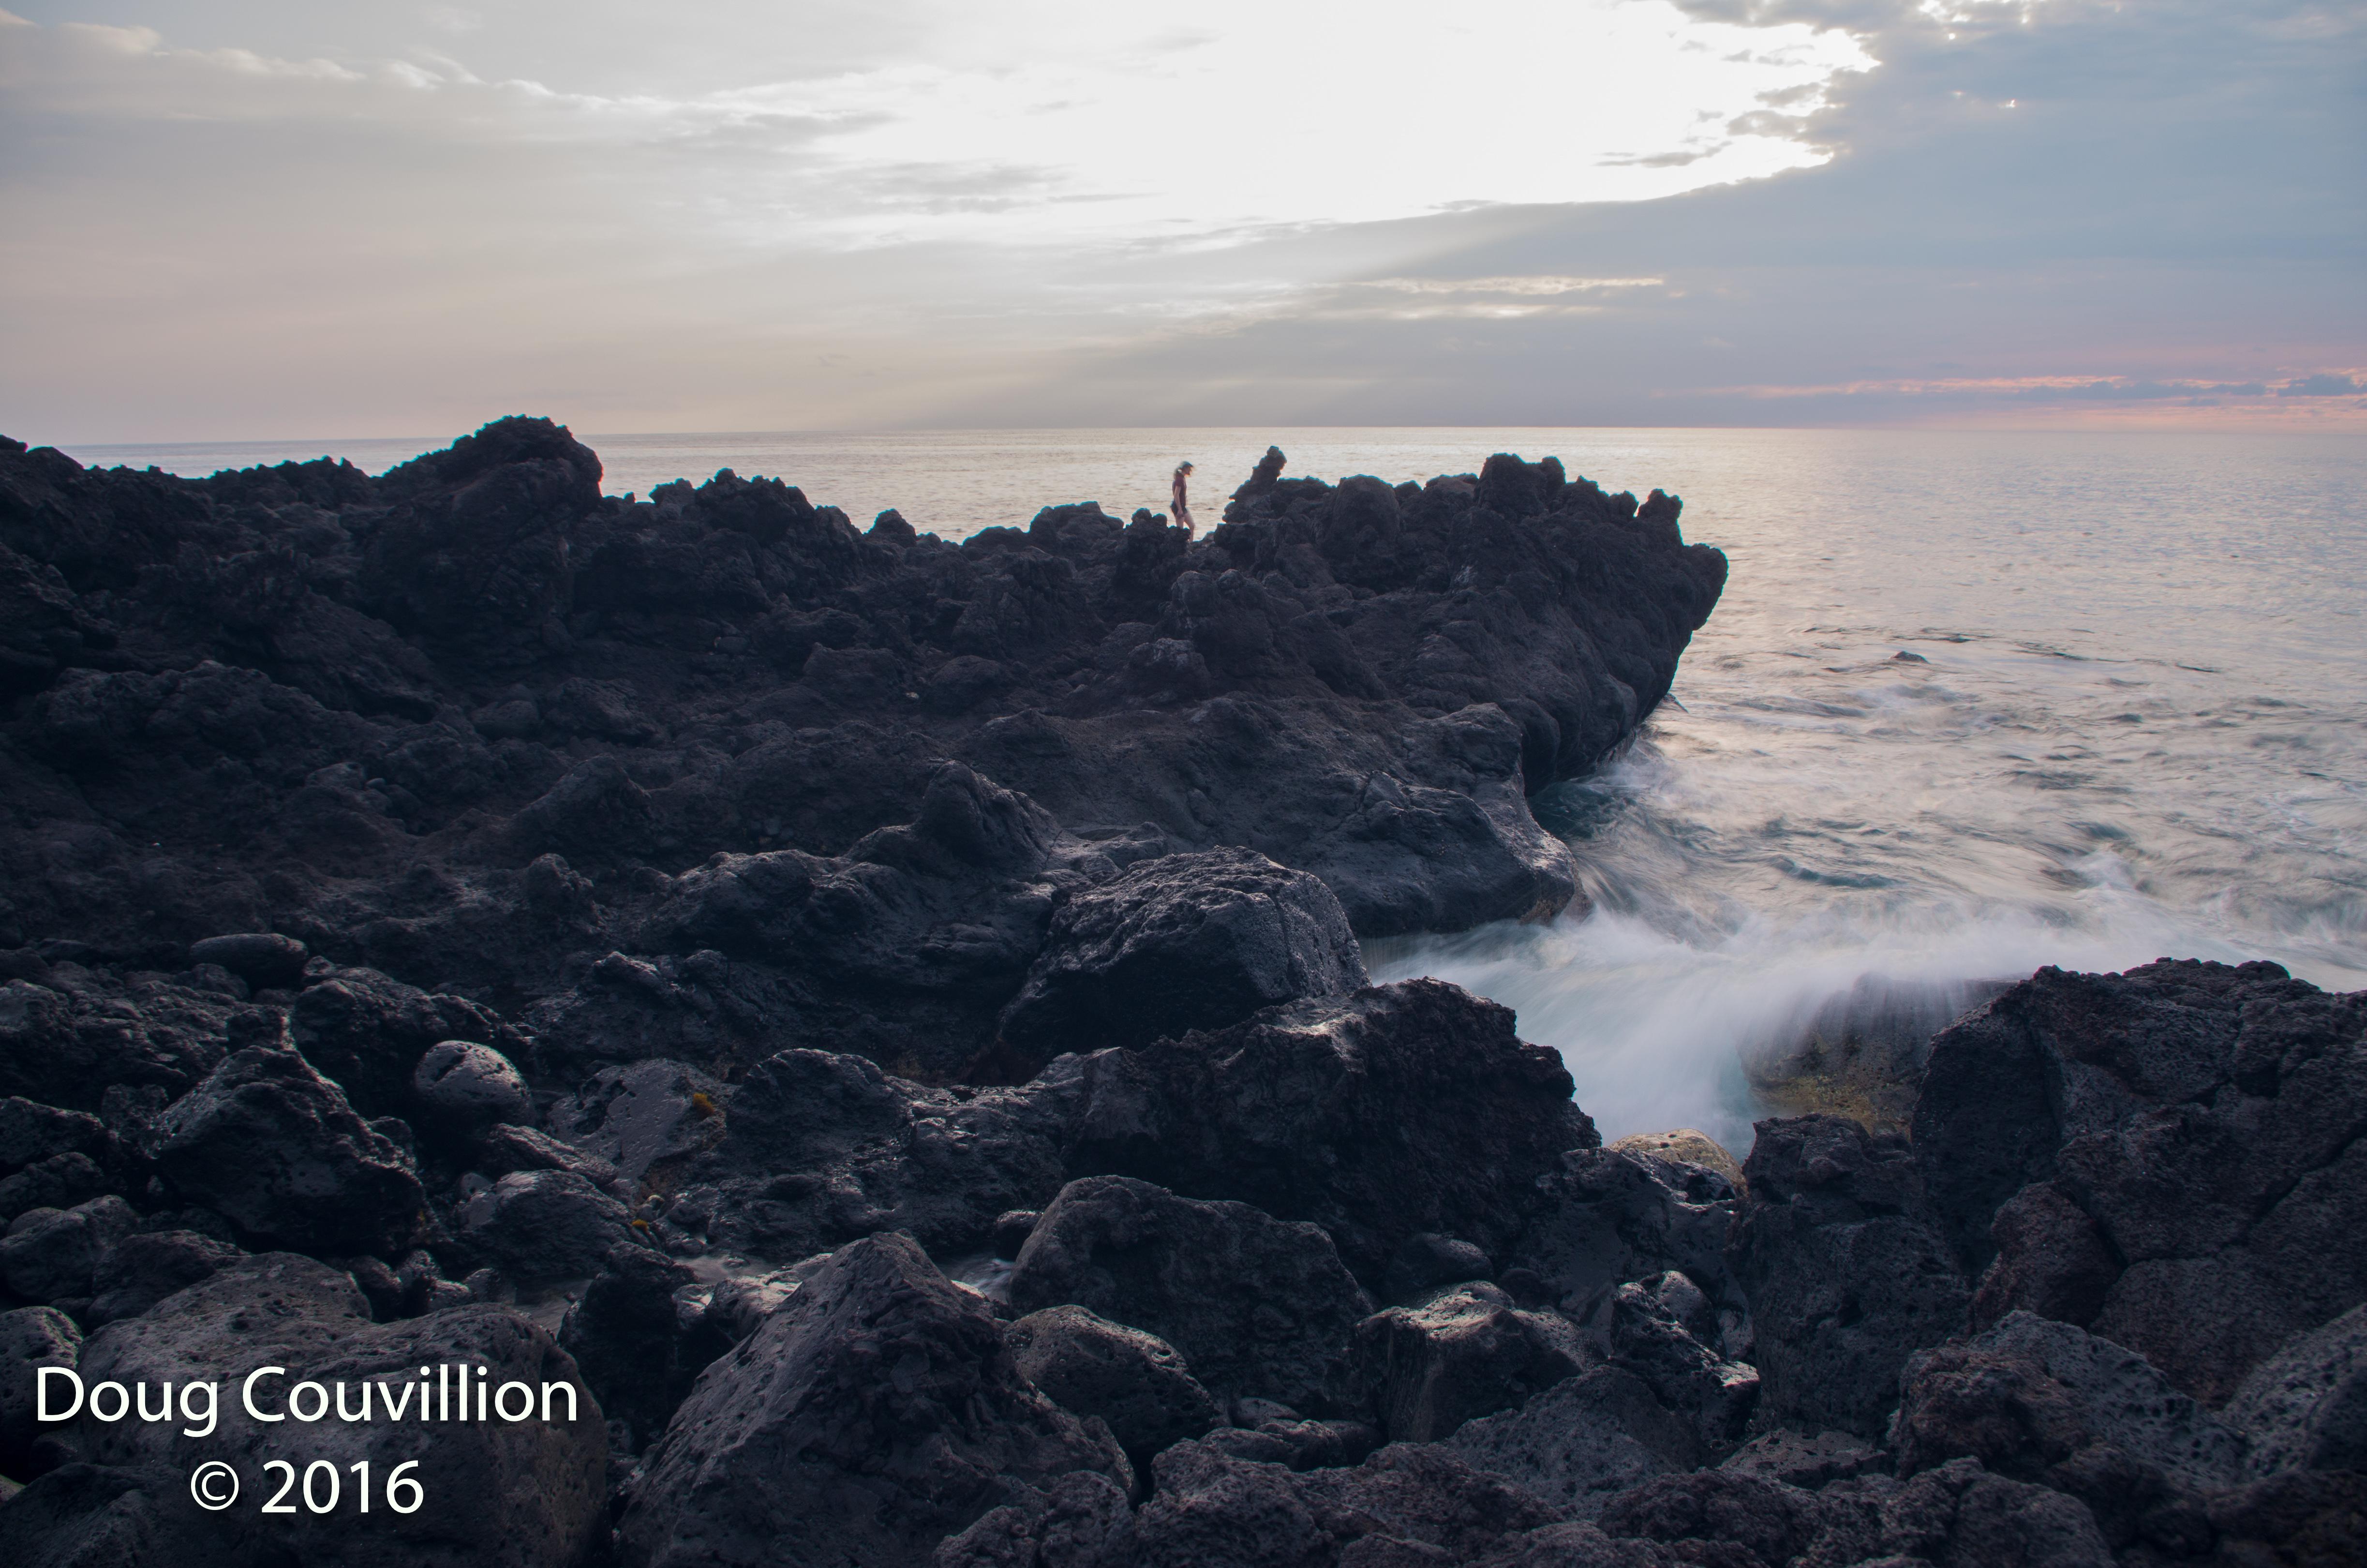 Photography by Doug Couvillion: Kona coast at sunset (1 of 4)